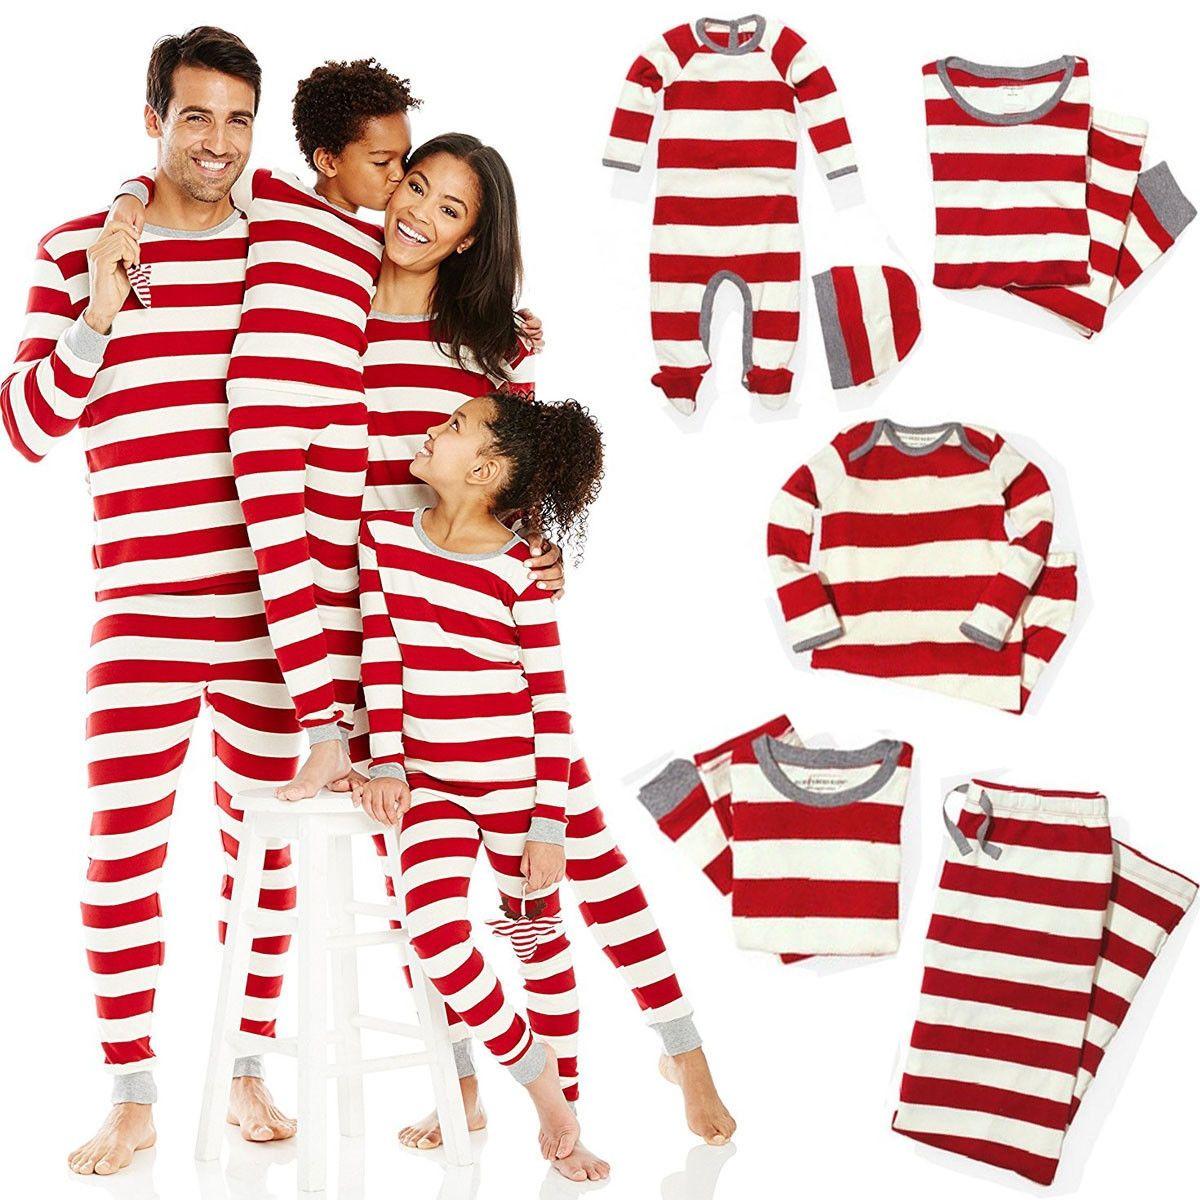 ebeff0b8ee Xmas Striped Family Matching Outfits Set Christmas Family Pajamas Set Adult  Kid Sleepwear Nightwear Pjs Photgraphy